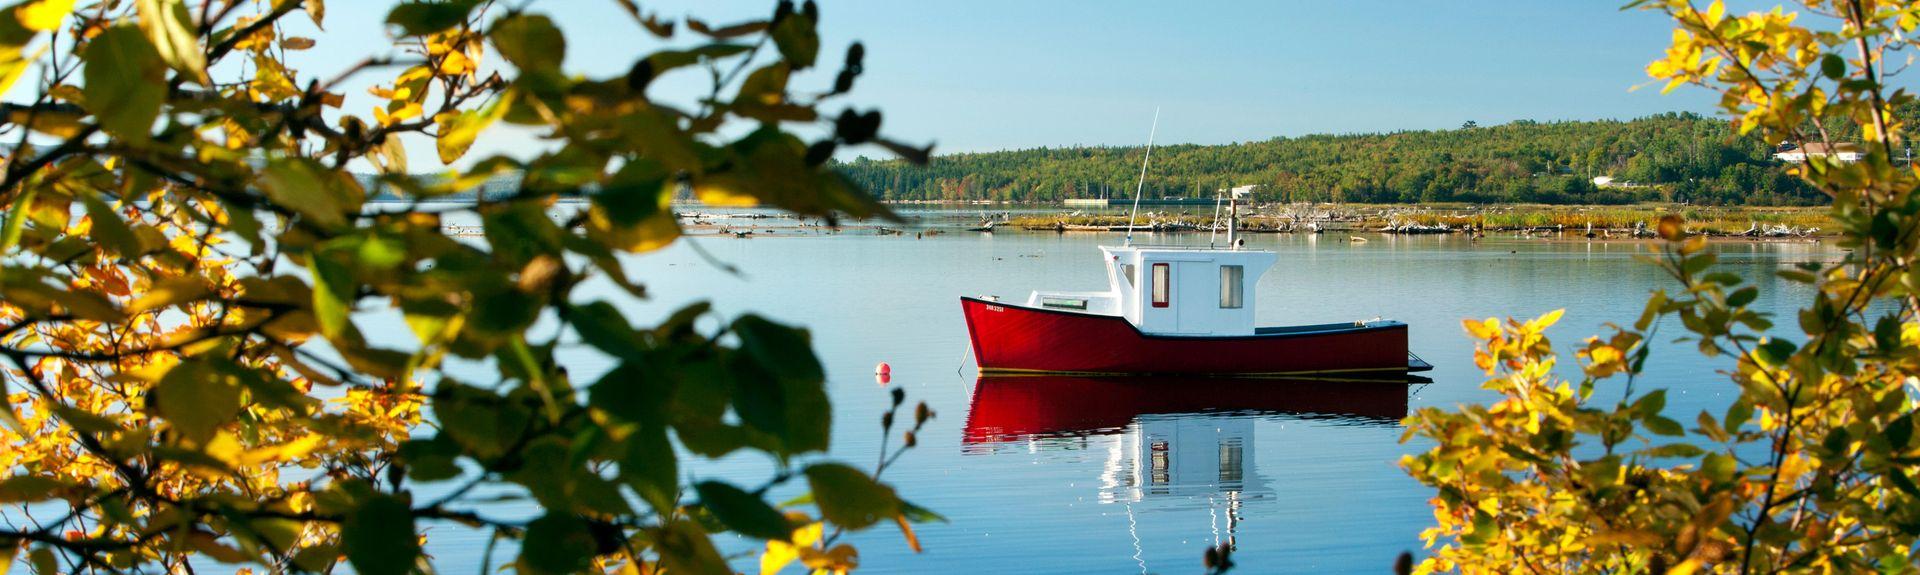 Baddeck, Nova Scotia, Canada